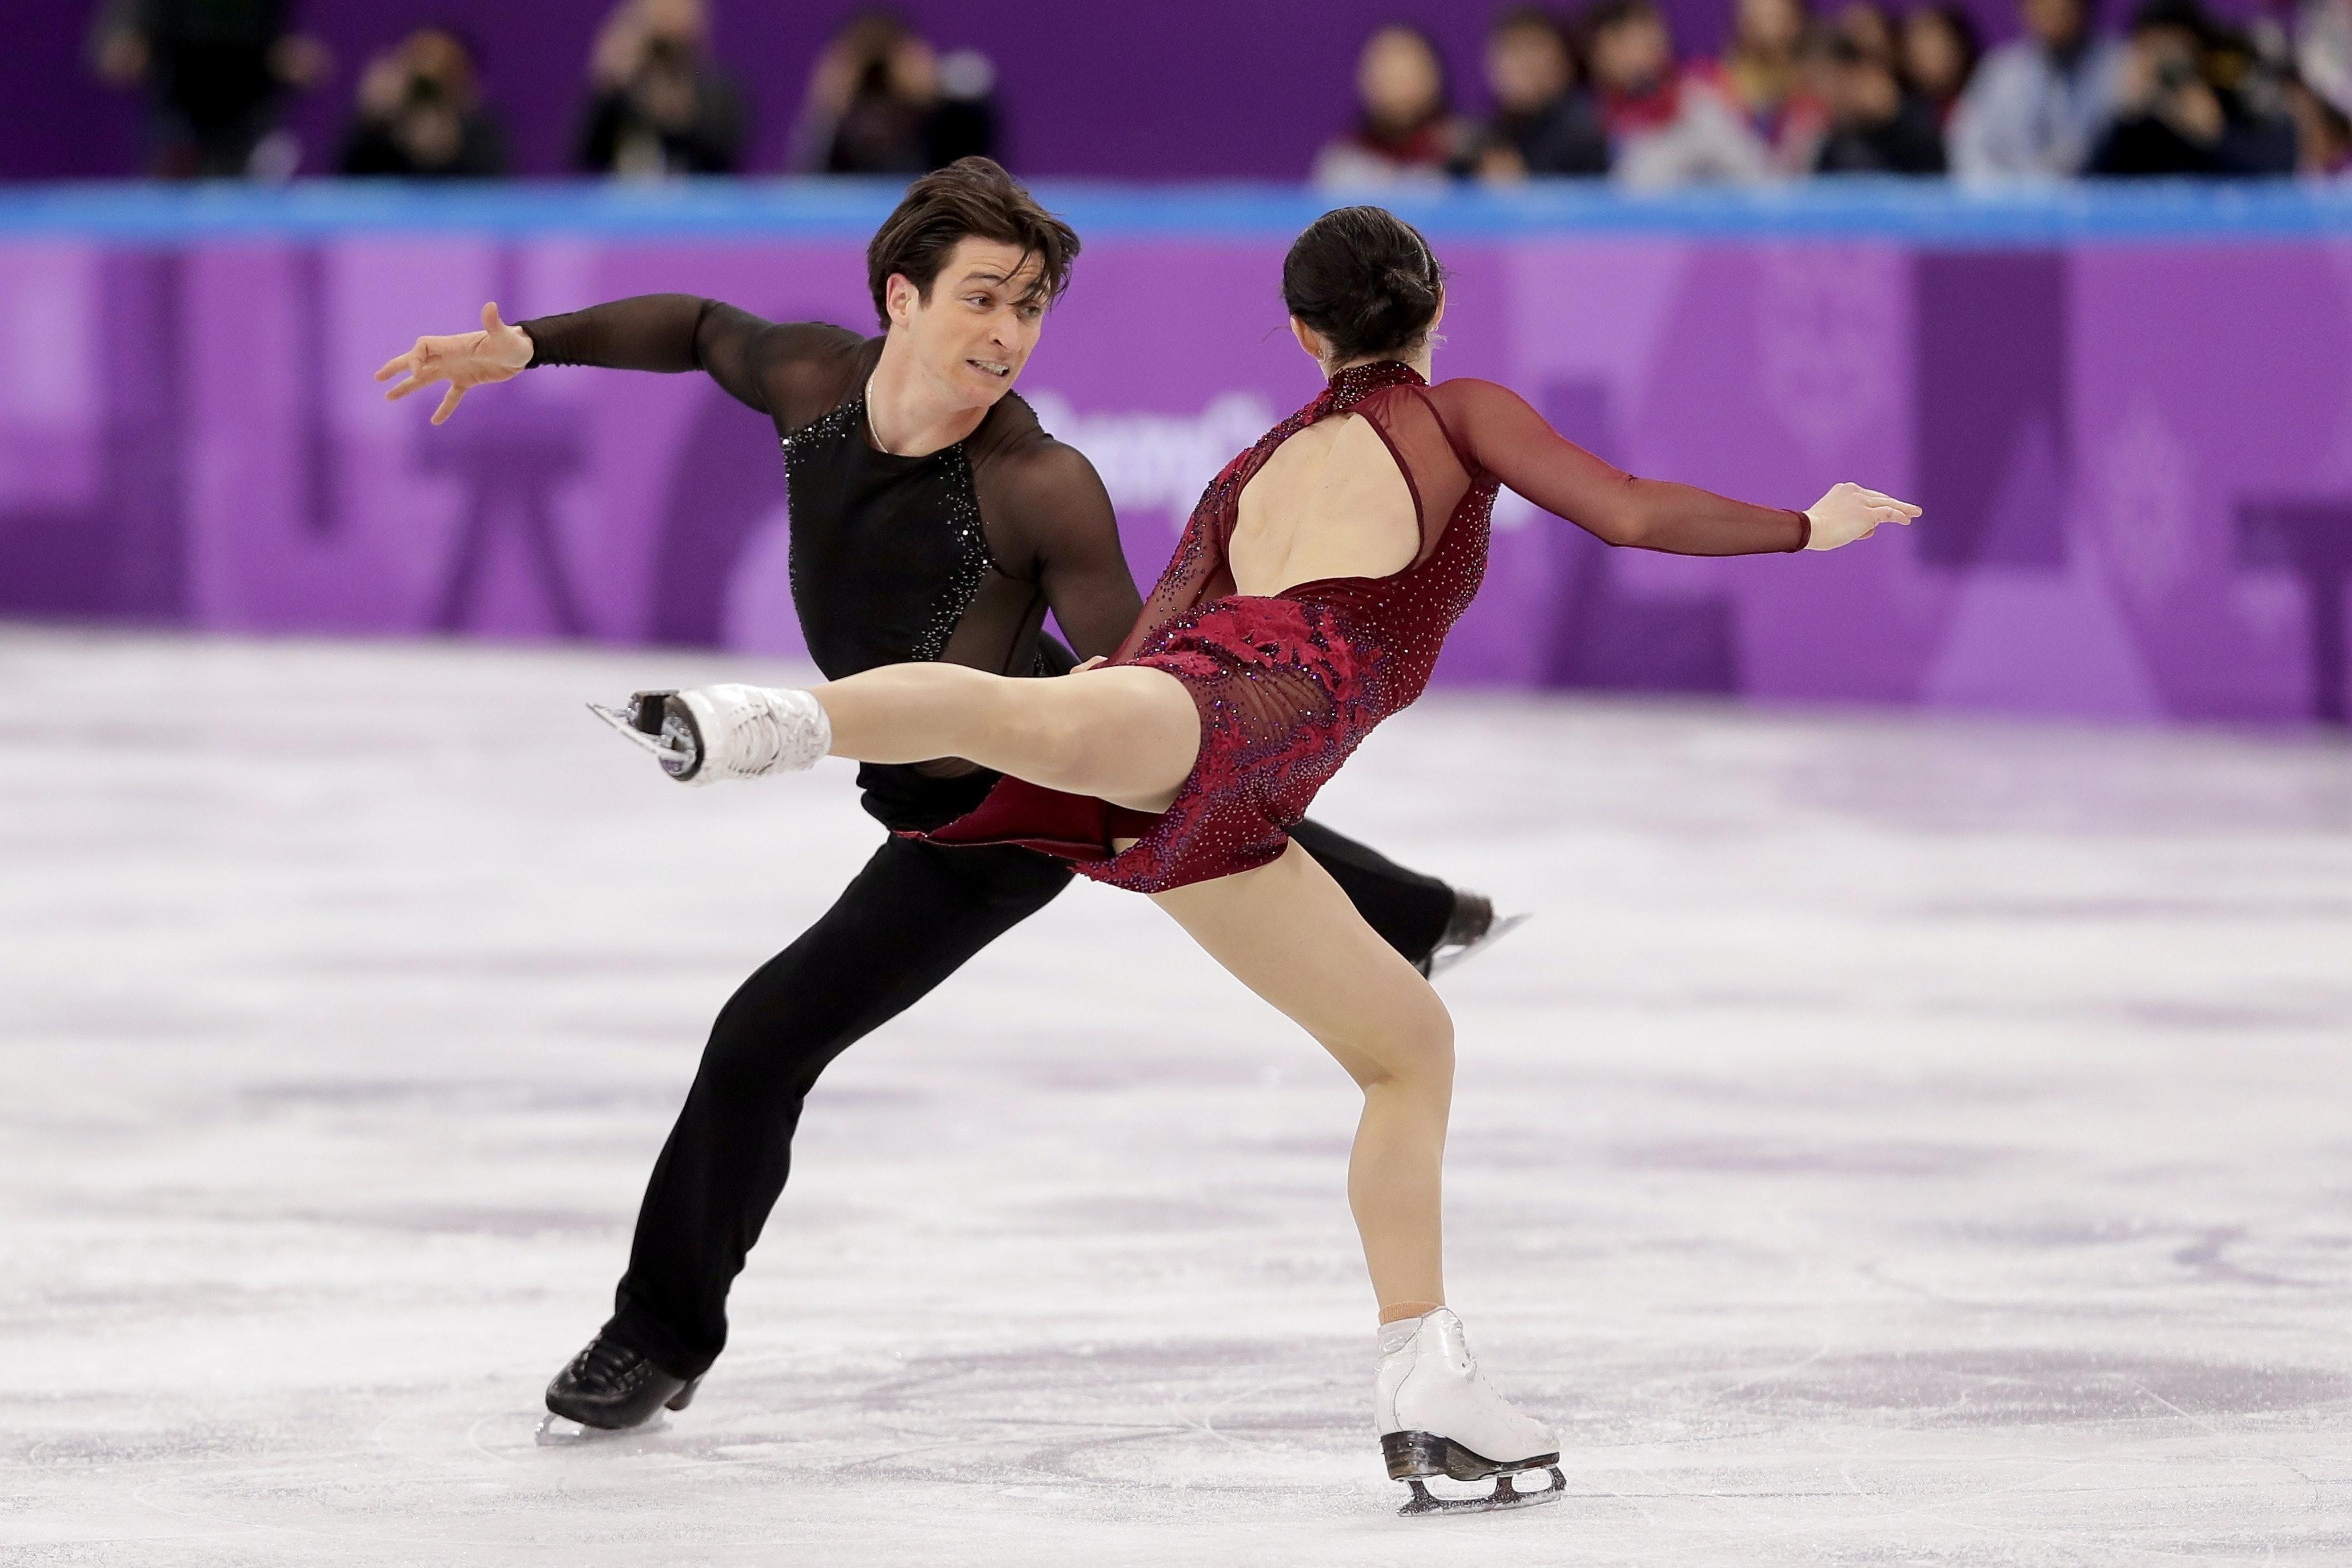 Are any figure skating pairs hookup